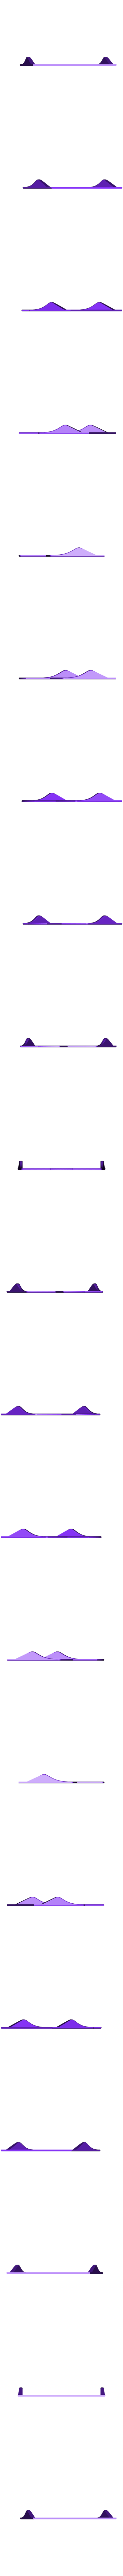 Printer_Slot_2.STL Download free STL file Table Organizer - Hand Printer • 3D print design, KuKu